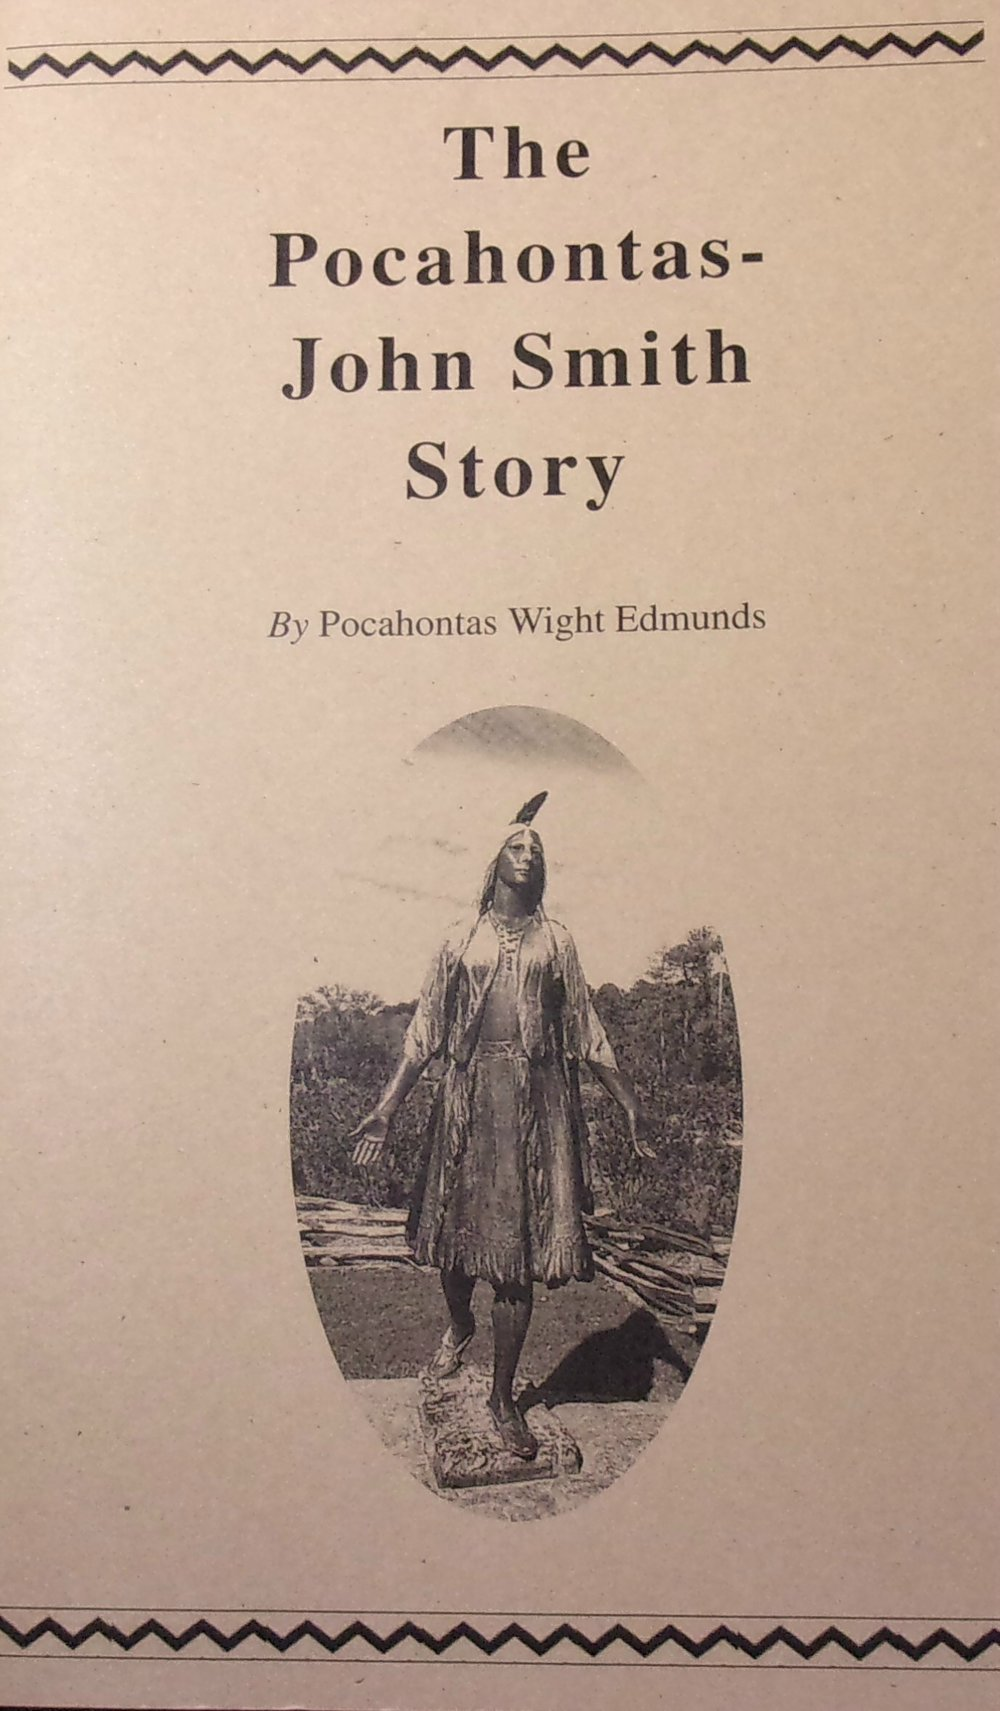 The Pocahontas-John Smith Story.jpg